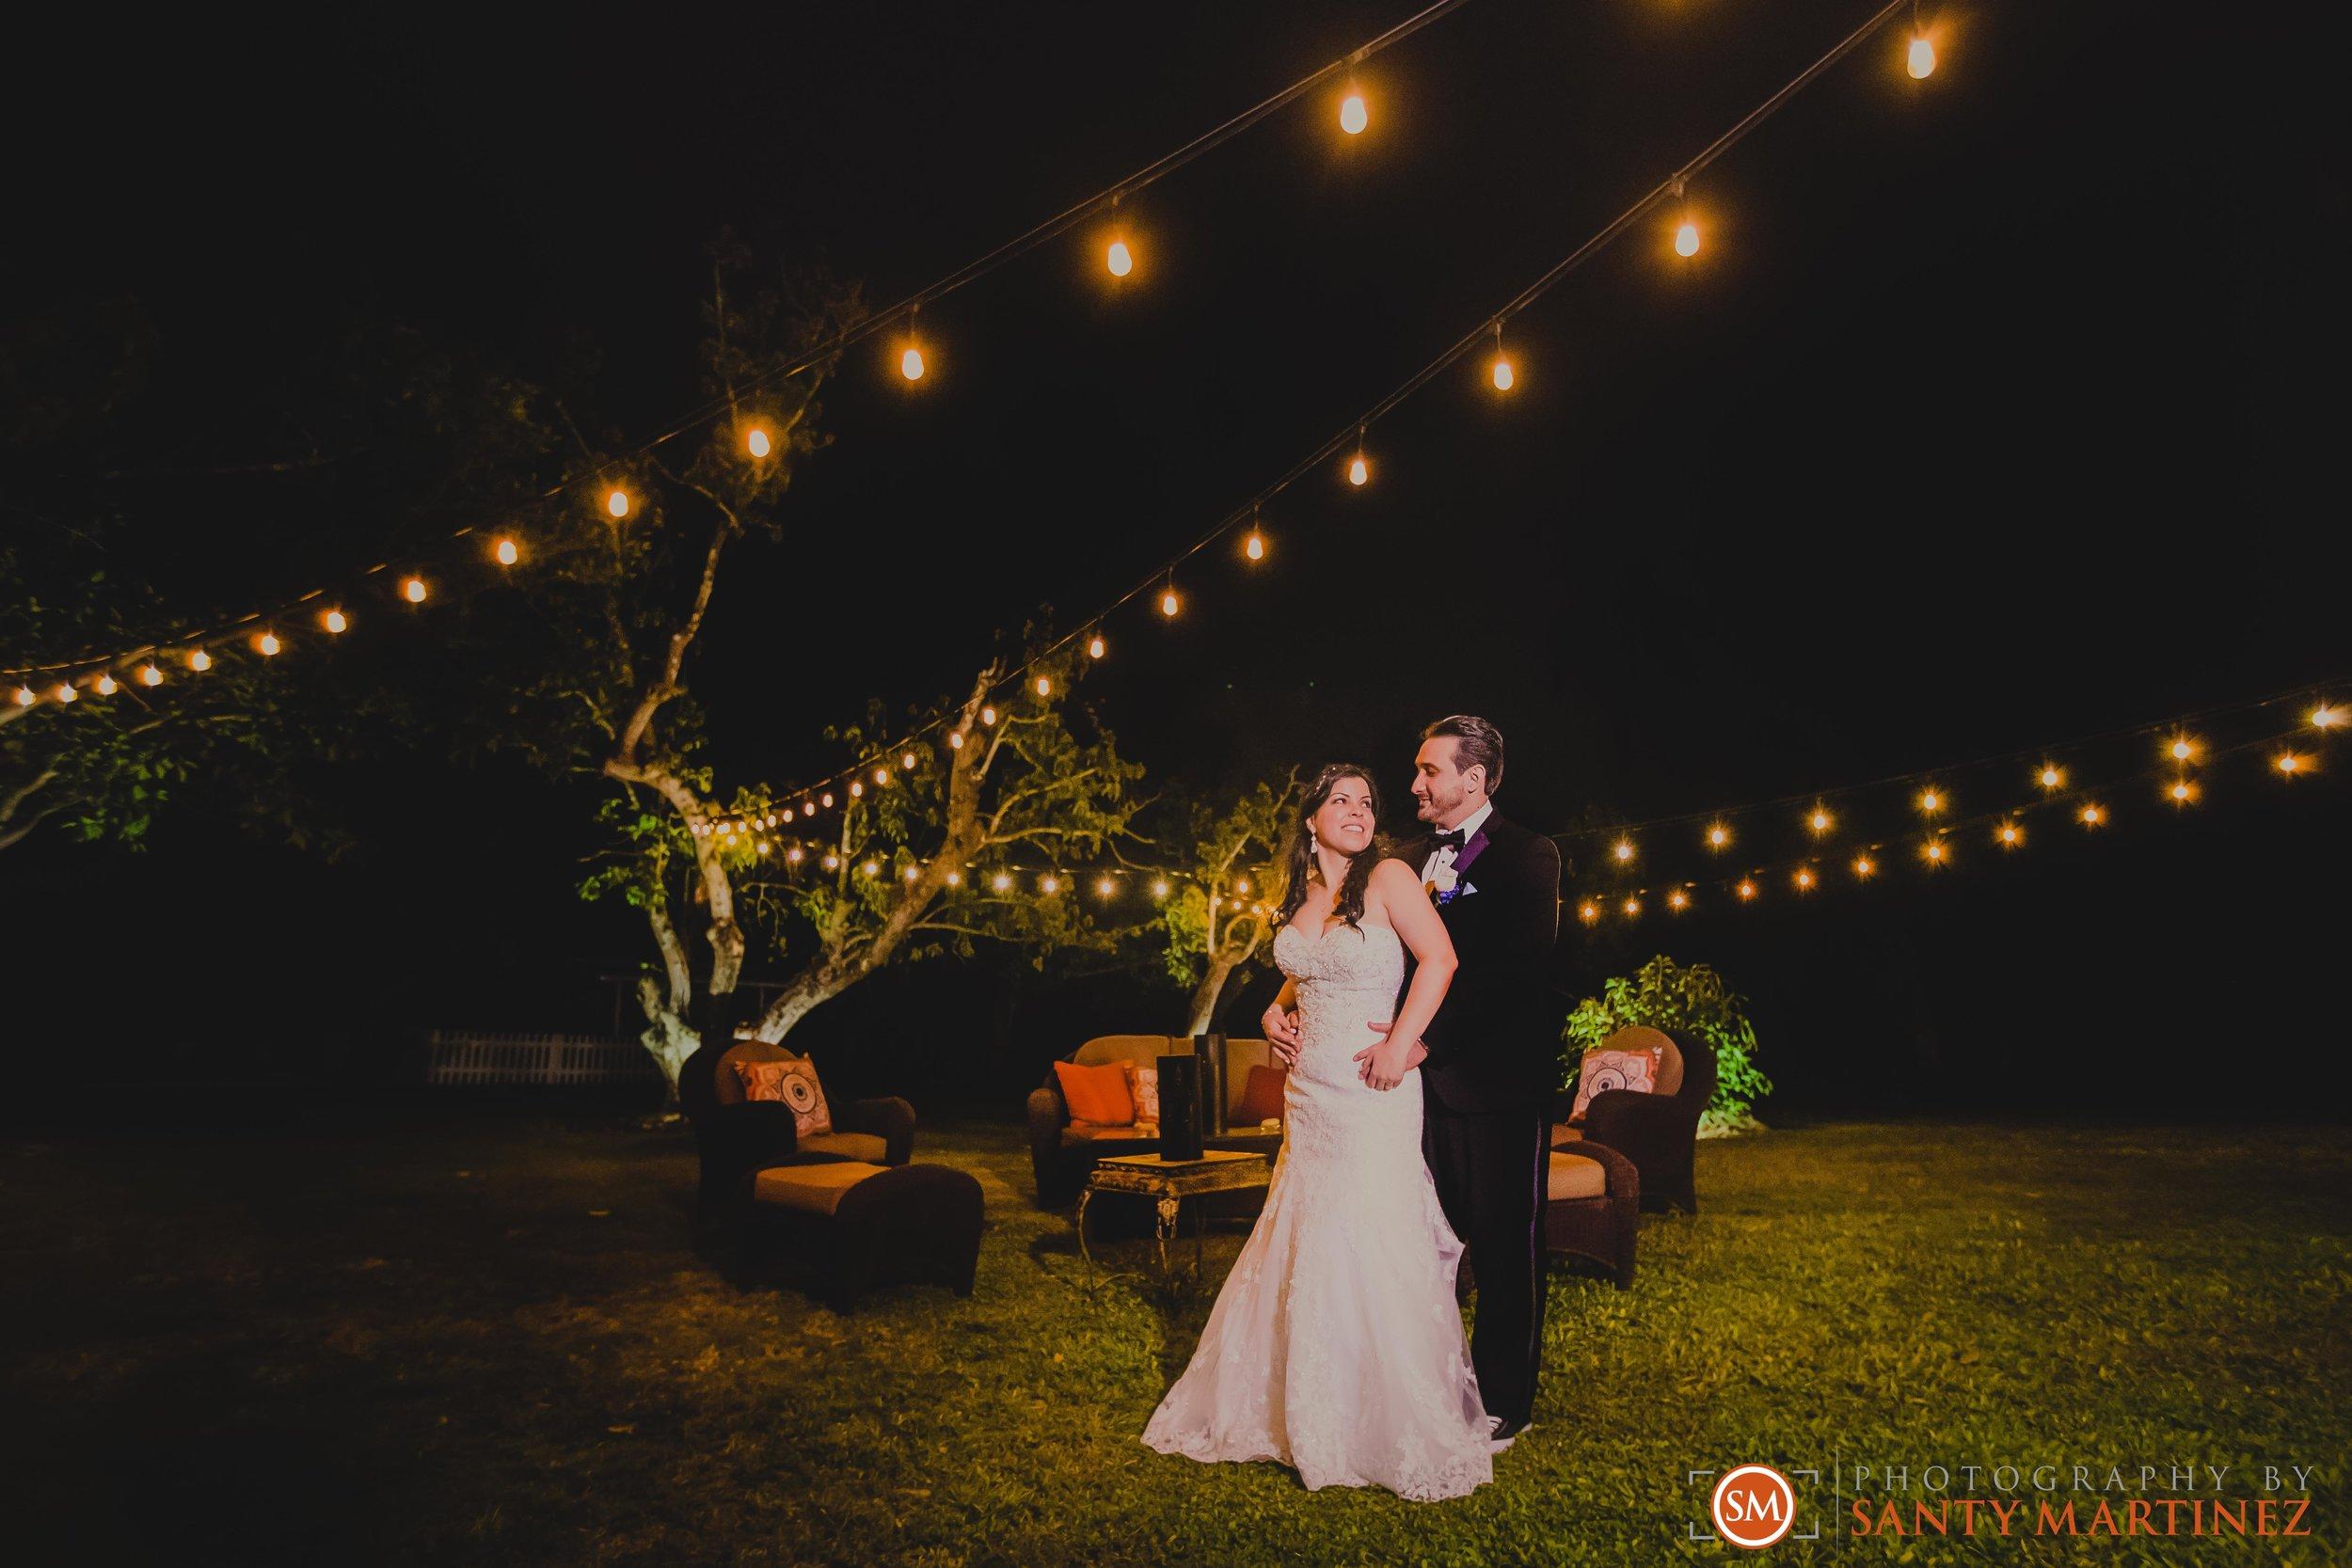 Wedding - Whimsical key West House - Photography by Santy Martinez-40.jpg